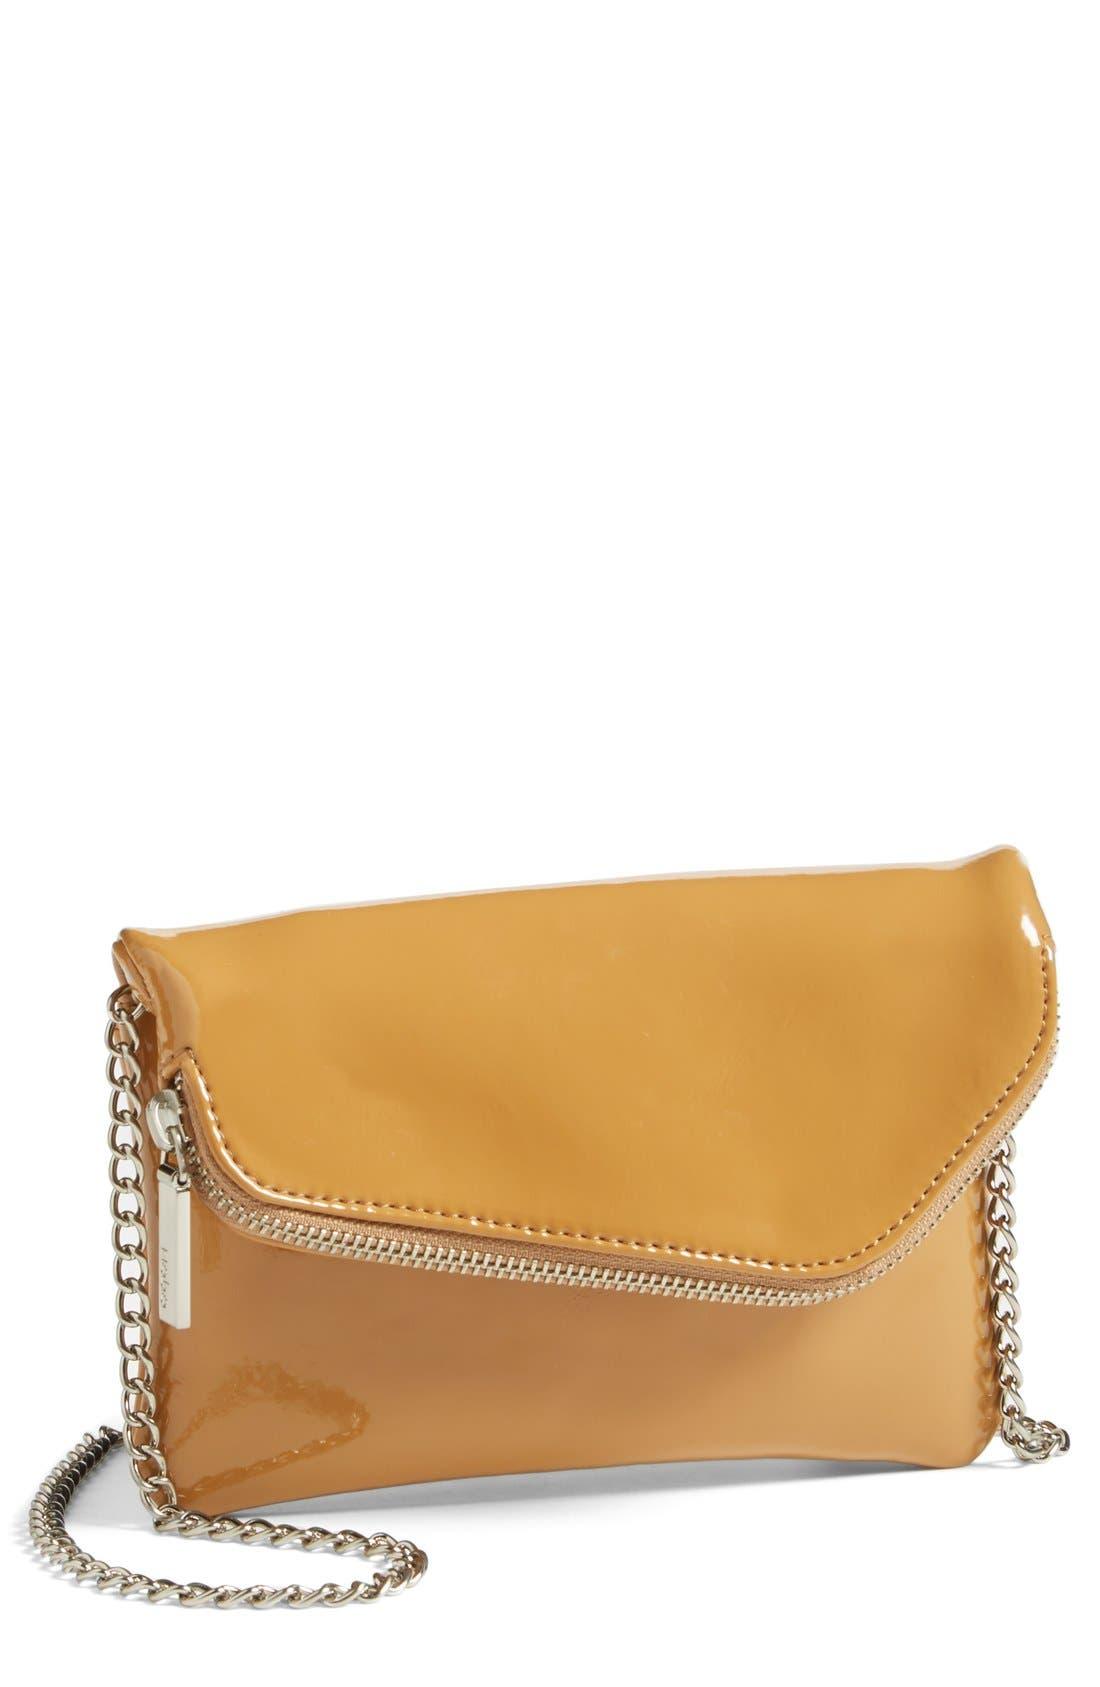 Main Image - Hobo 'Daria' Patent Leather Crossbody